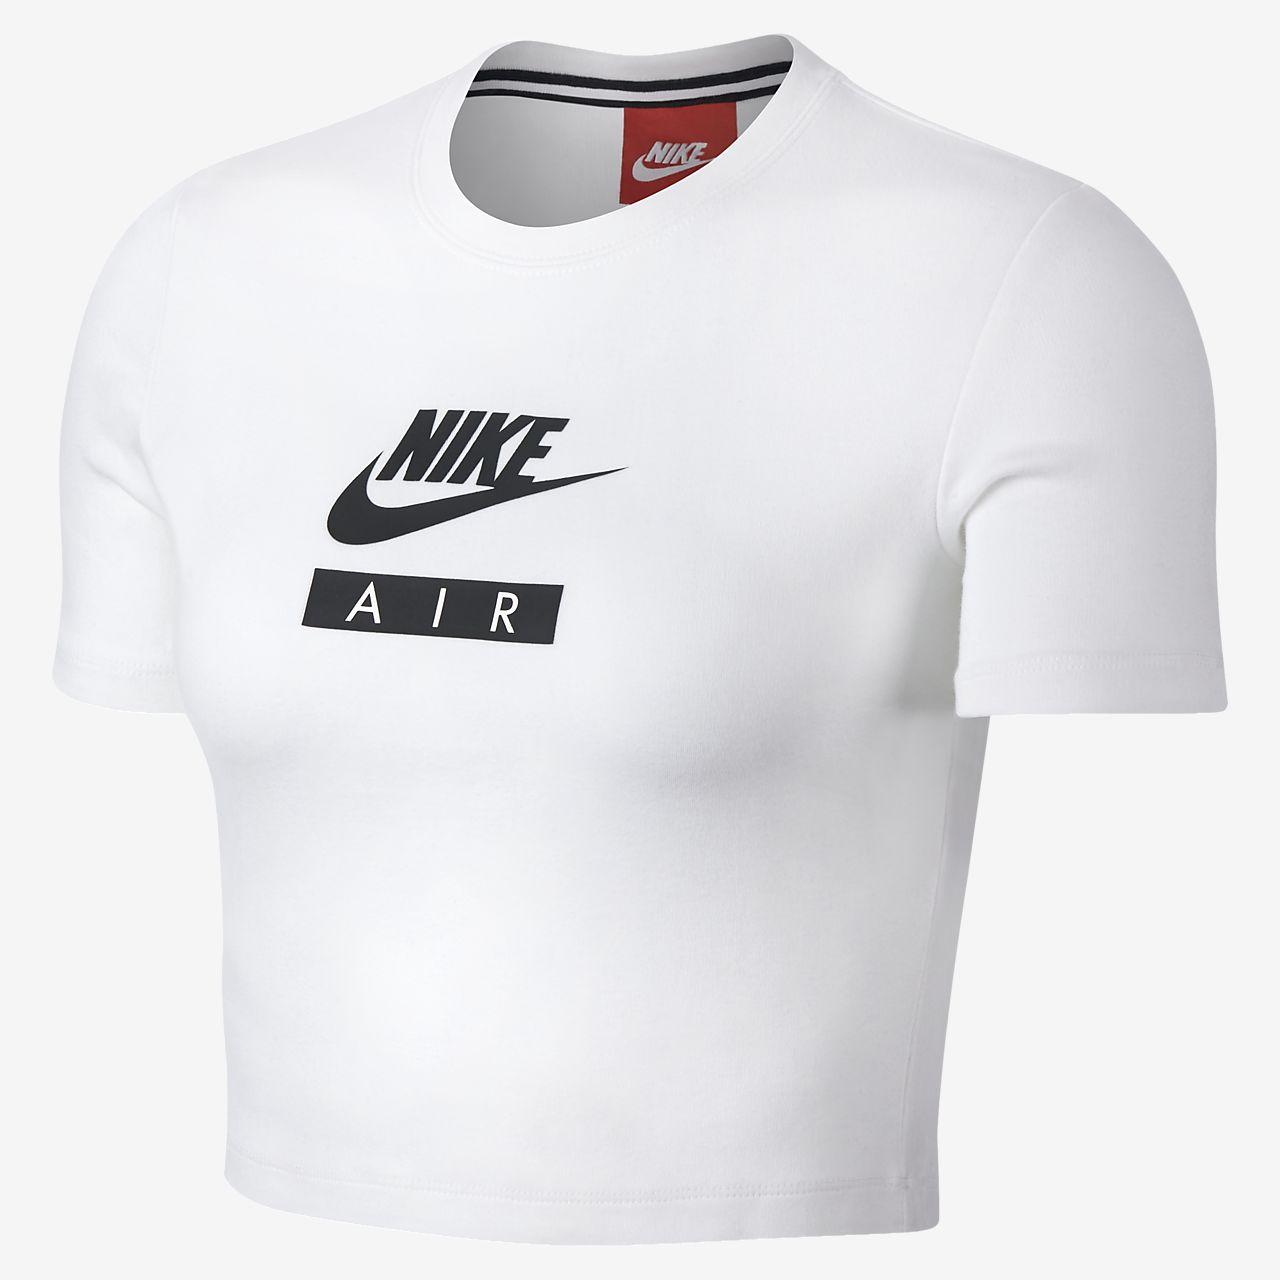 nike frauen t-shirt